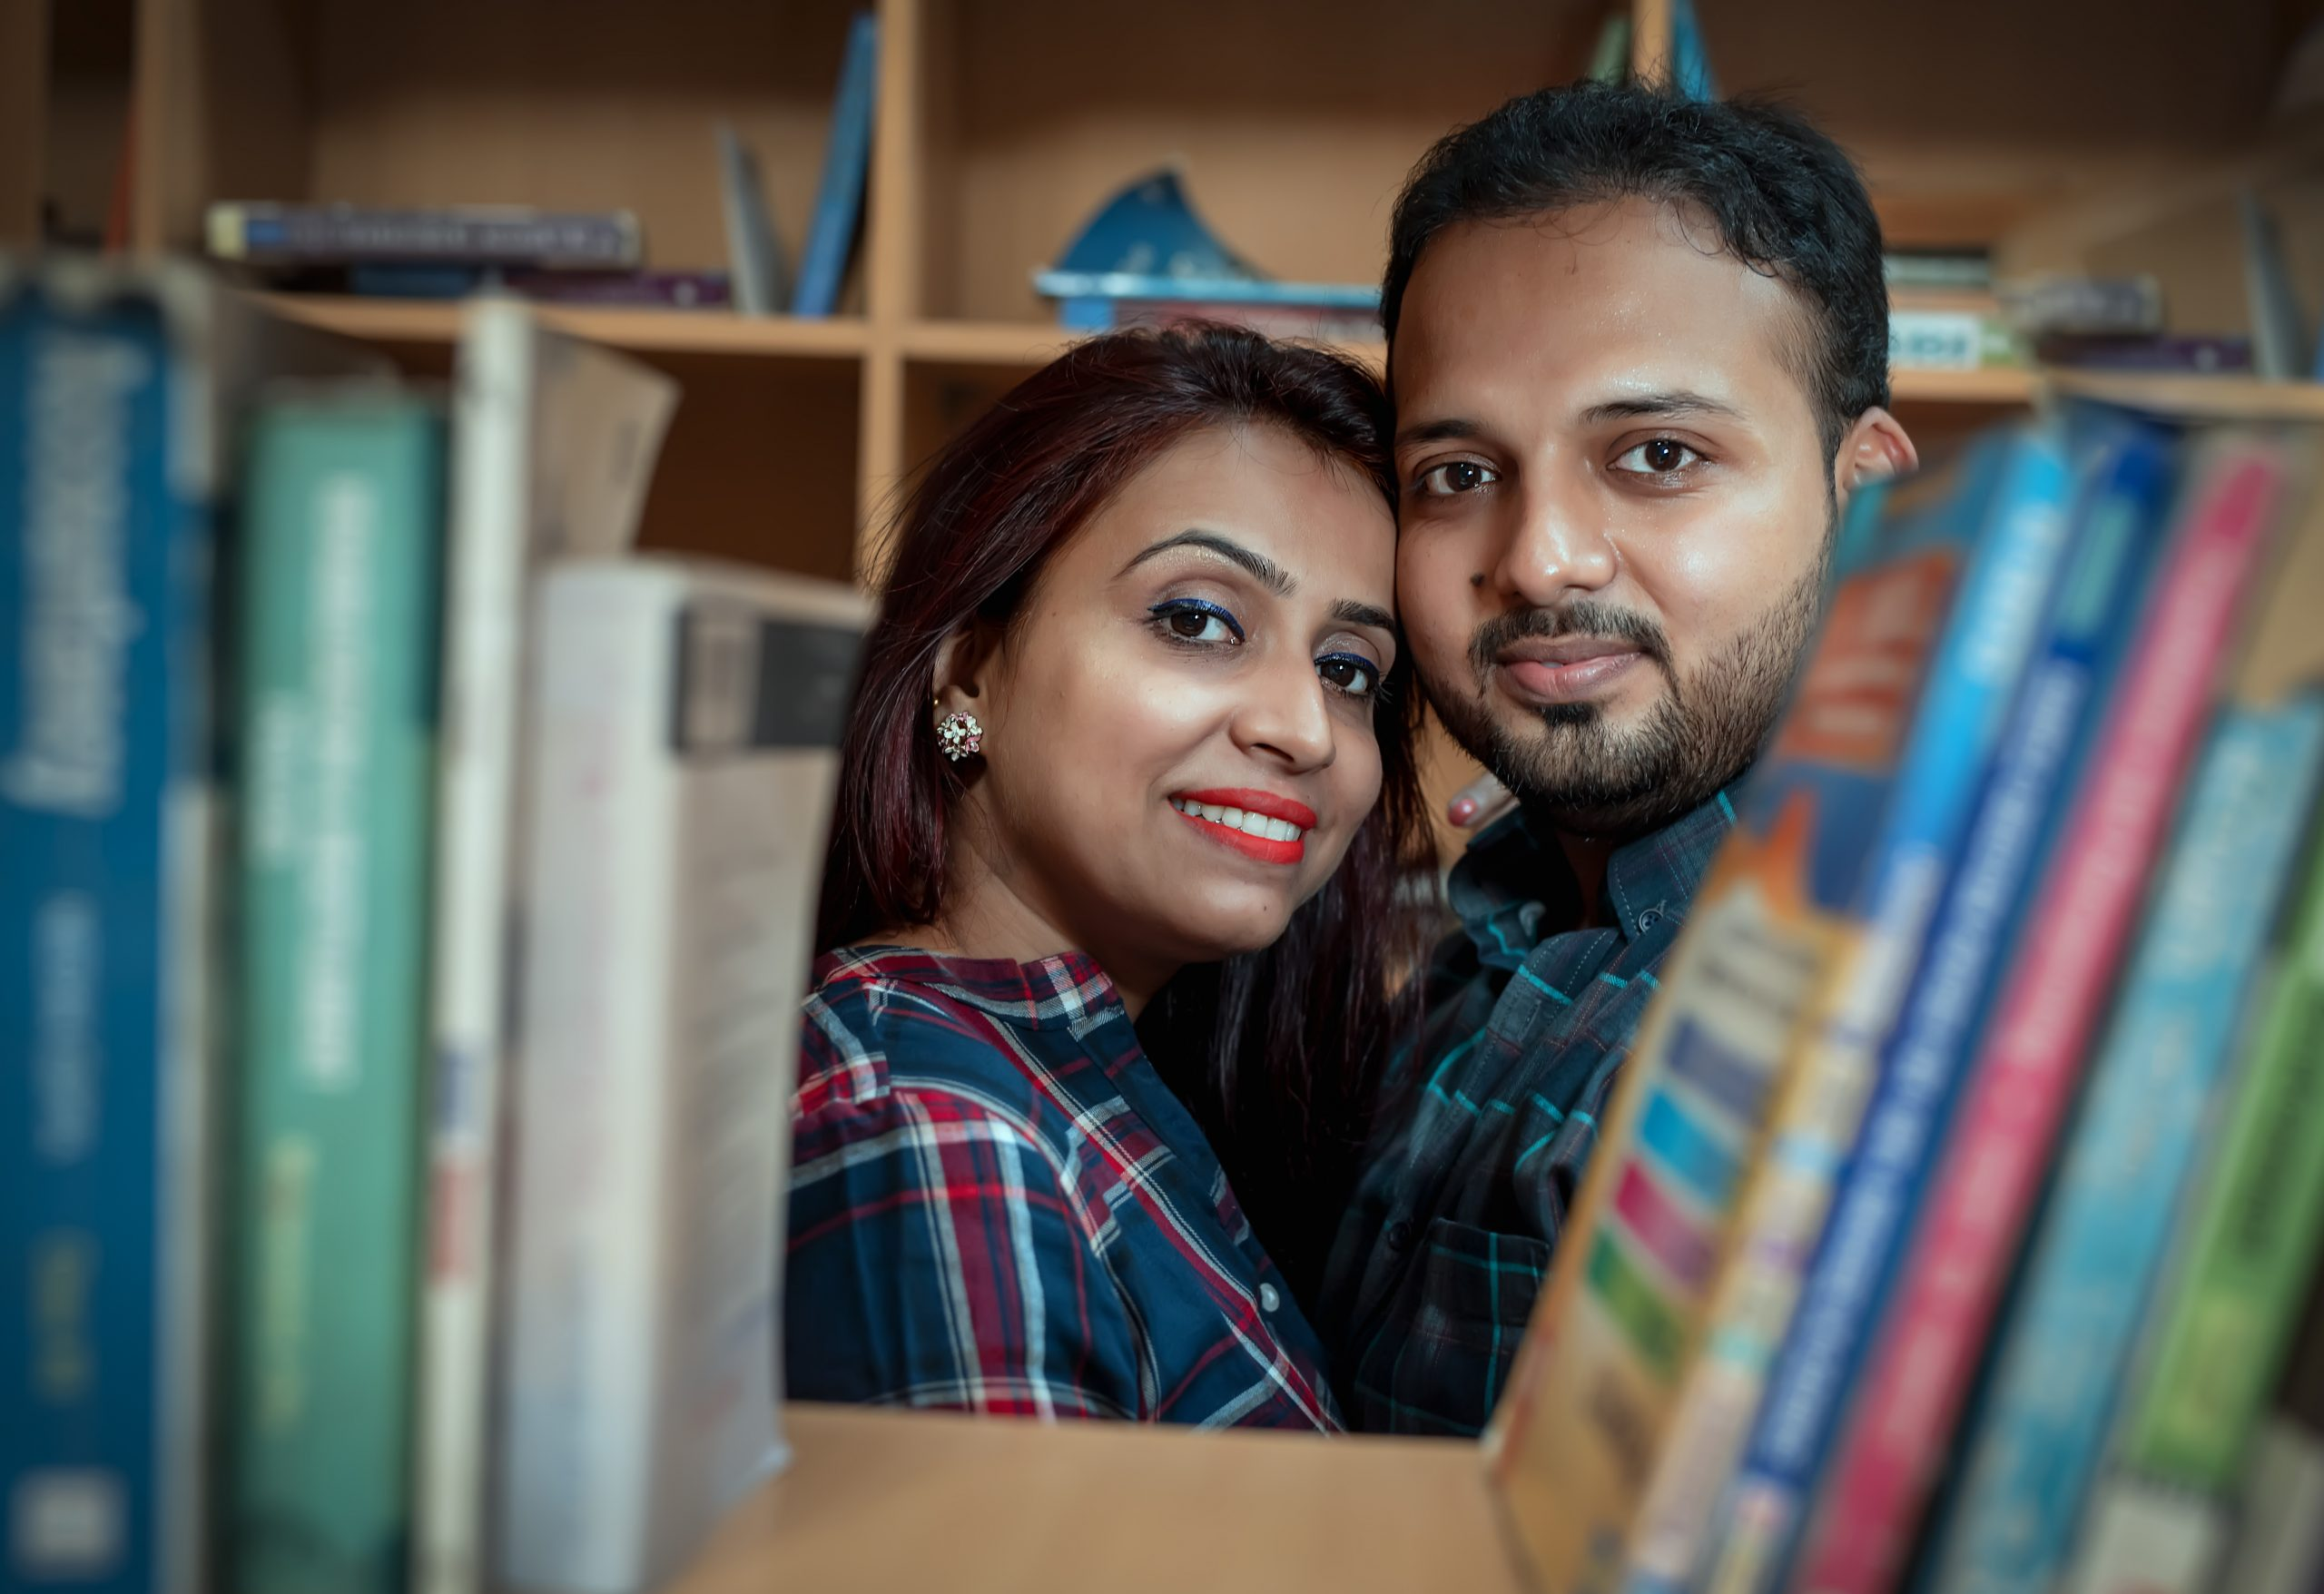 couple posing amidst books